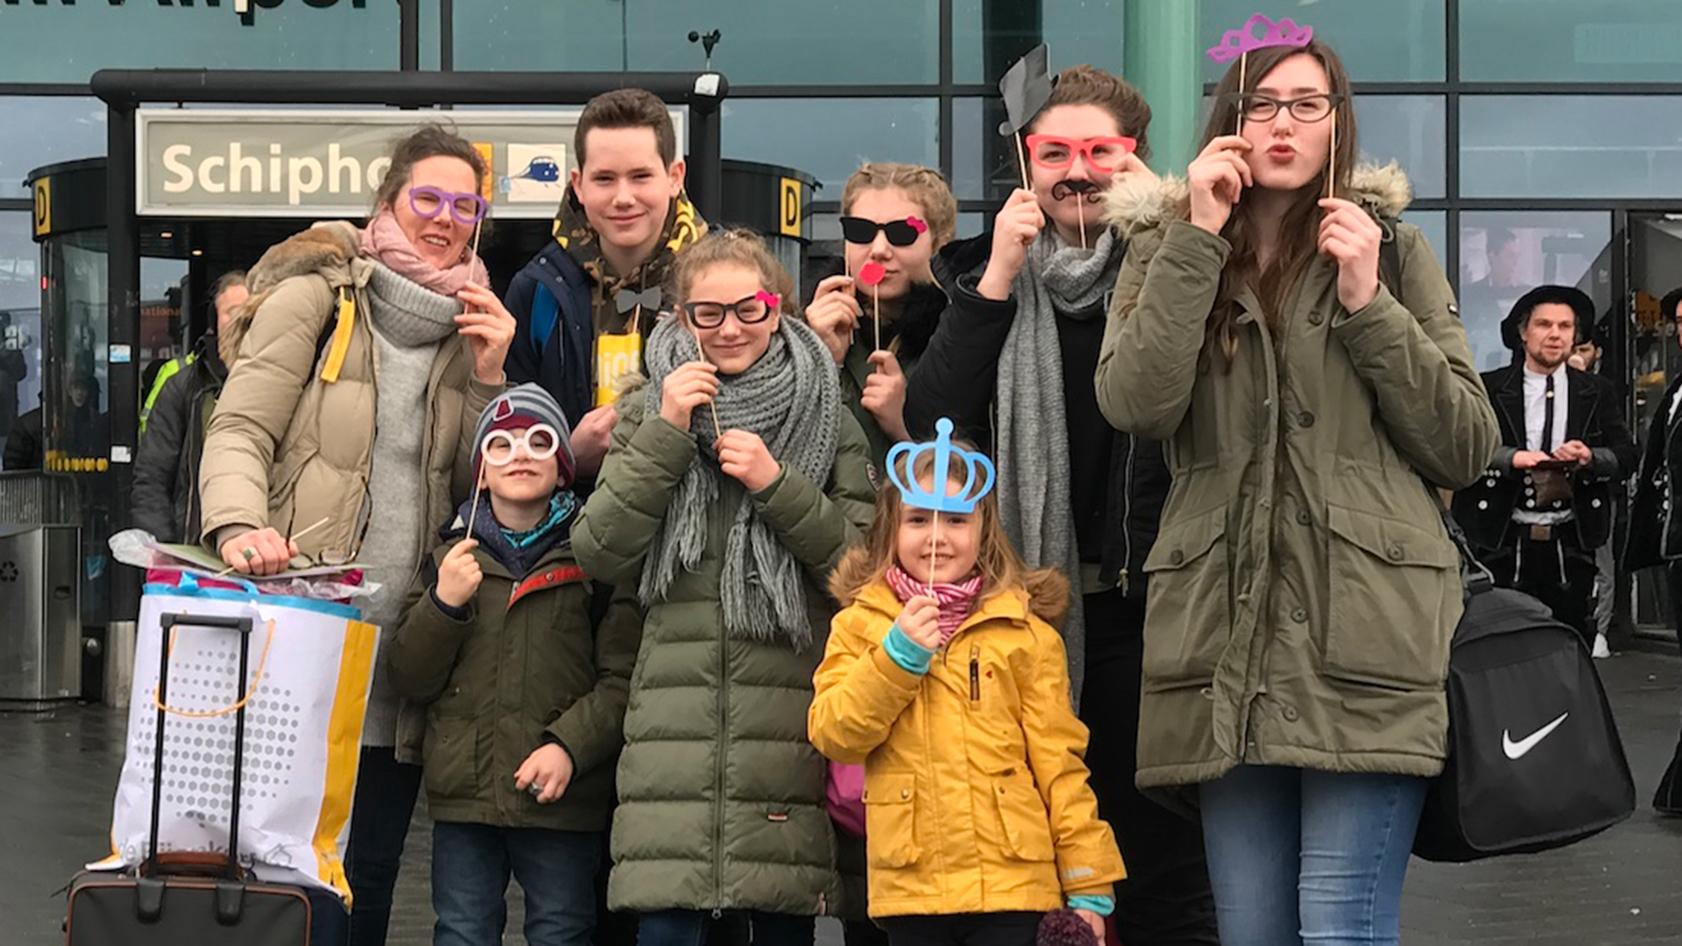 Großfamilie Großfamilienmama Ausflug Großfamilienmutter Goßfamilienmama Amsterdam Mamablog Hebamme Kerstin Lüking Mamablogger Mutterkutter Kiel